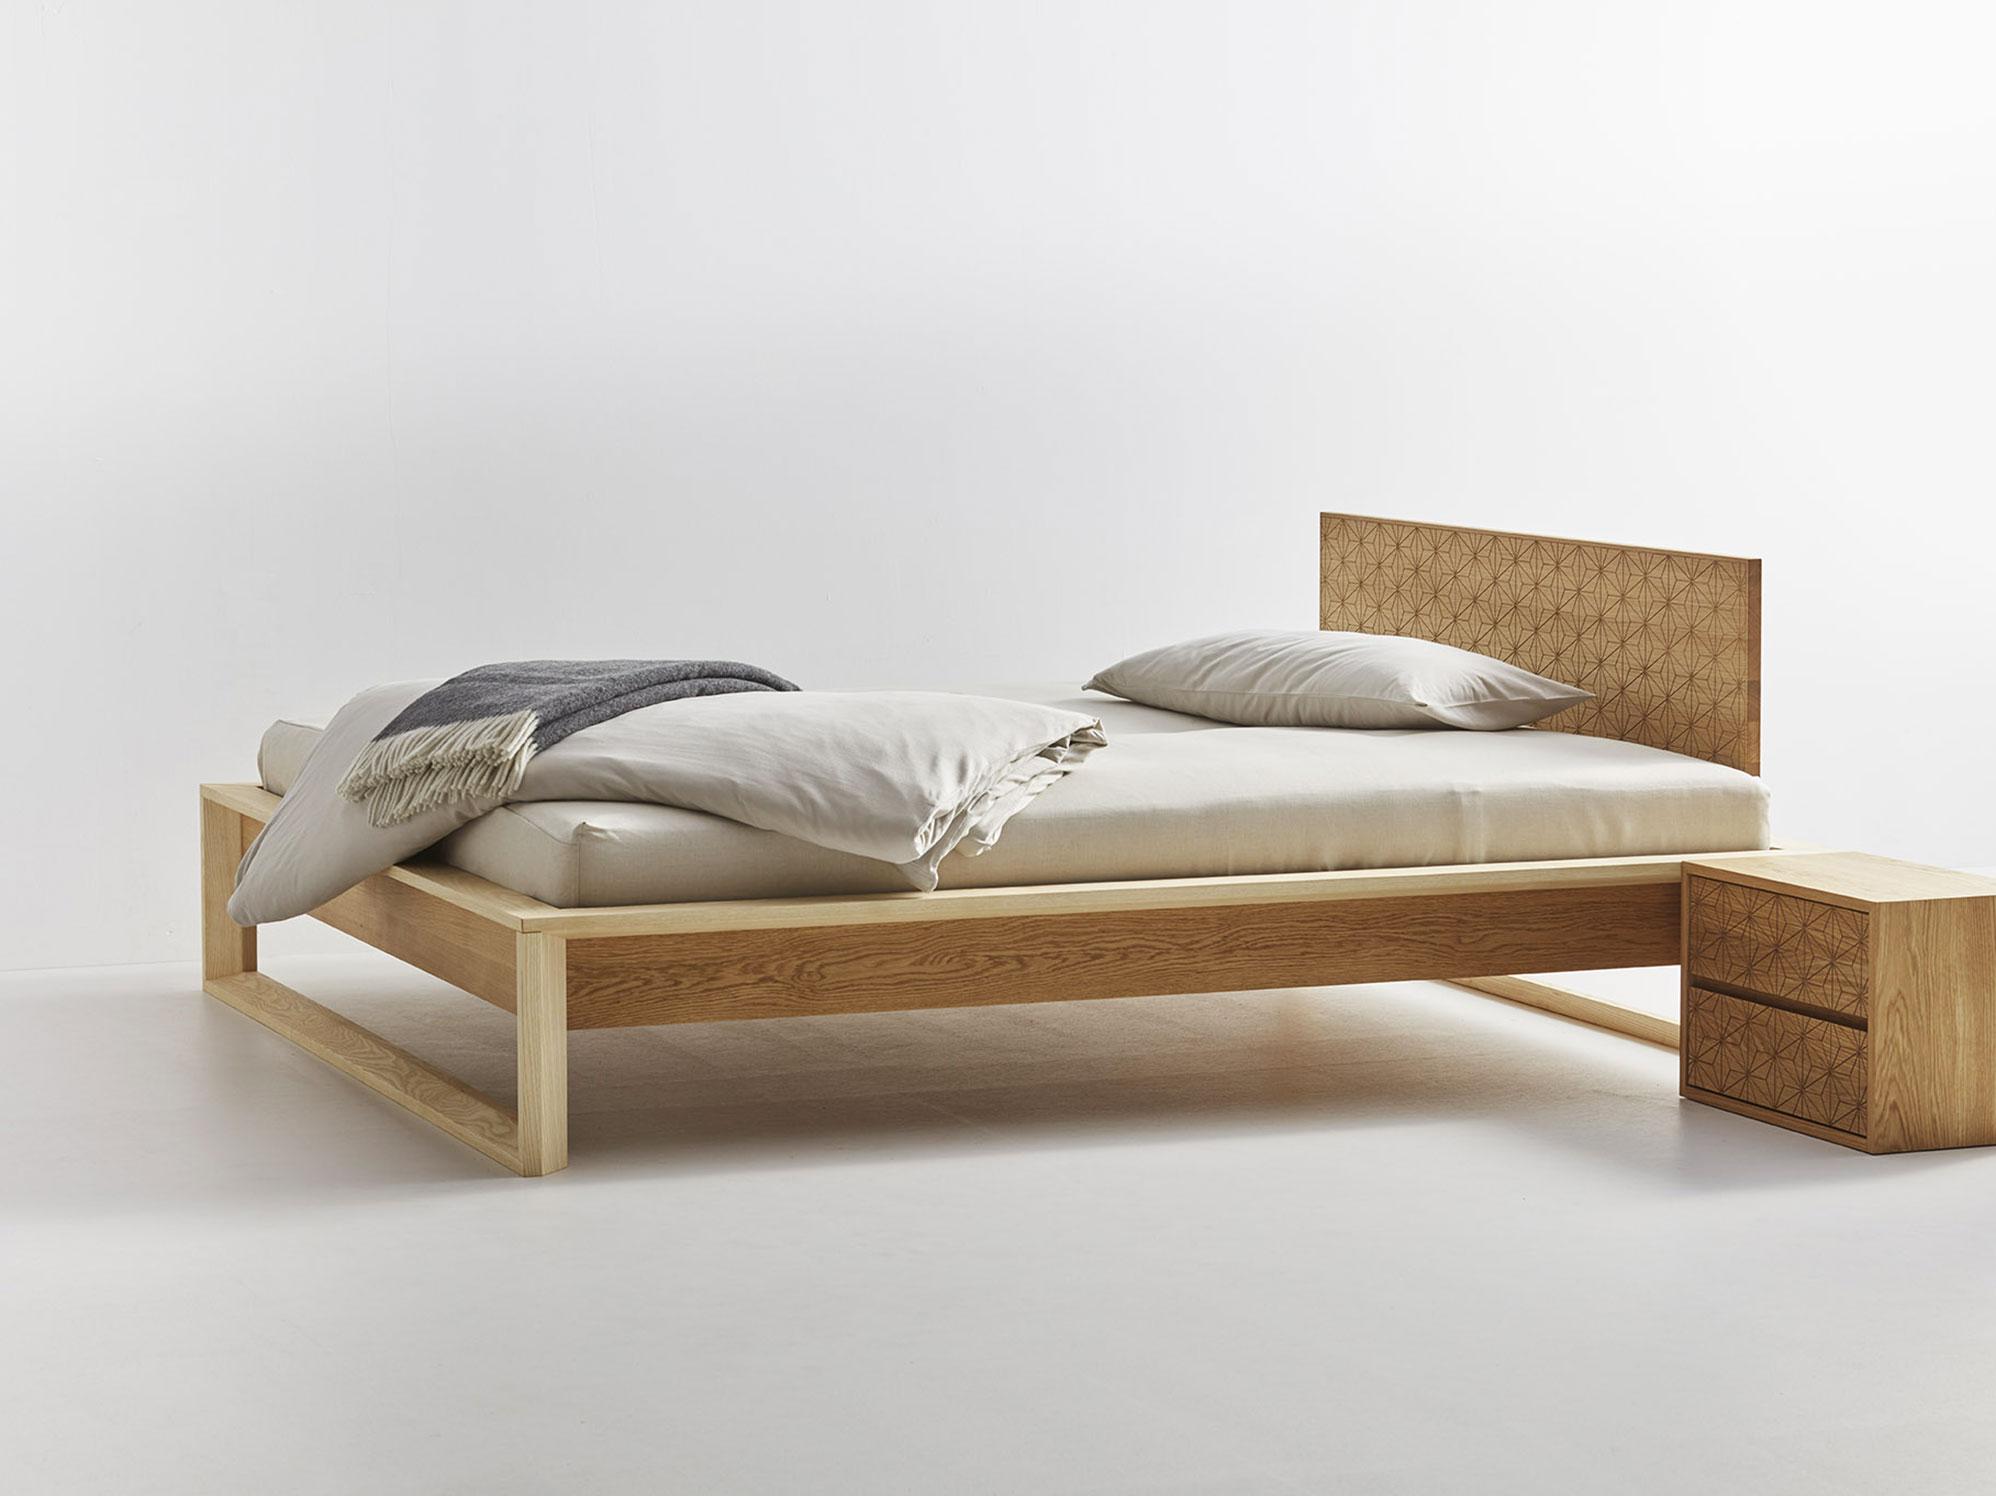 asanoha bett mit betthaupt gr ne erde. Black Bedroom Furniture Sets. Home Design Ideas